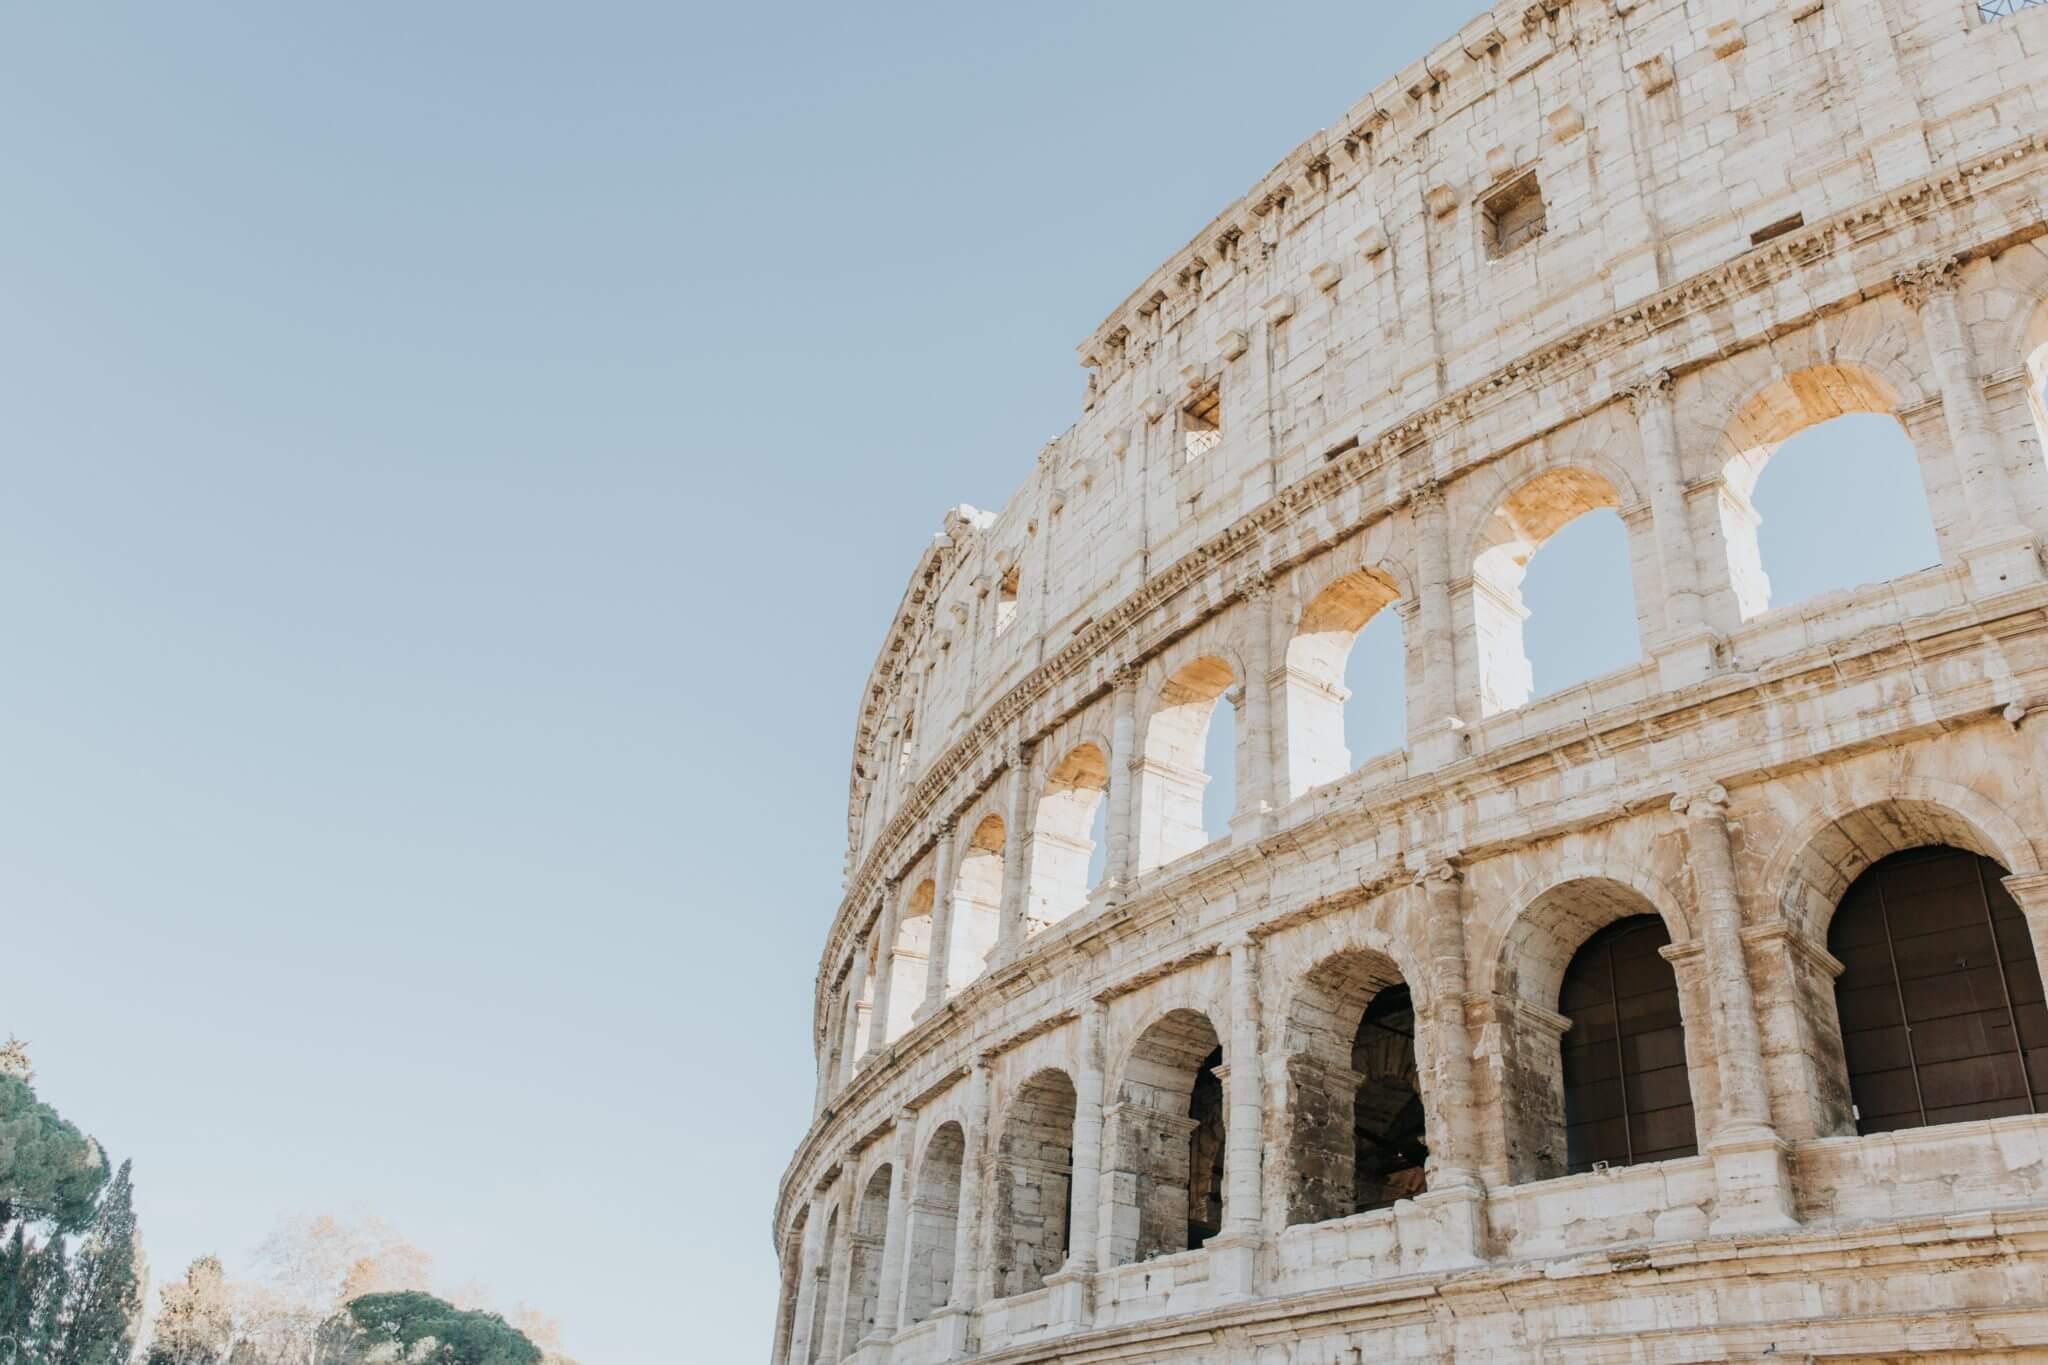 Italia - Colizeu - Photo by Braden Collum on Unsplash